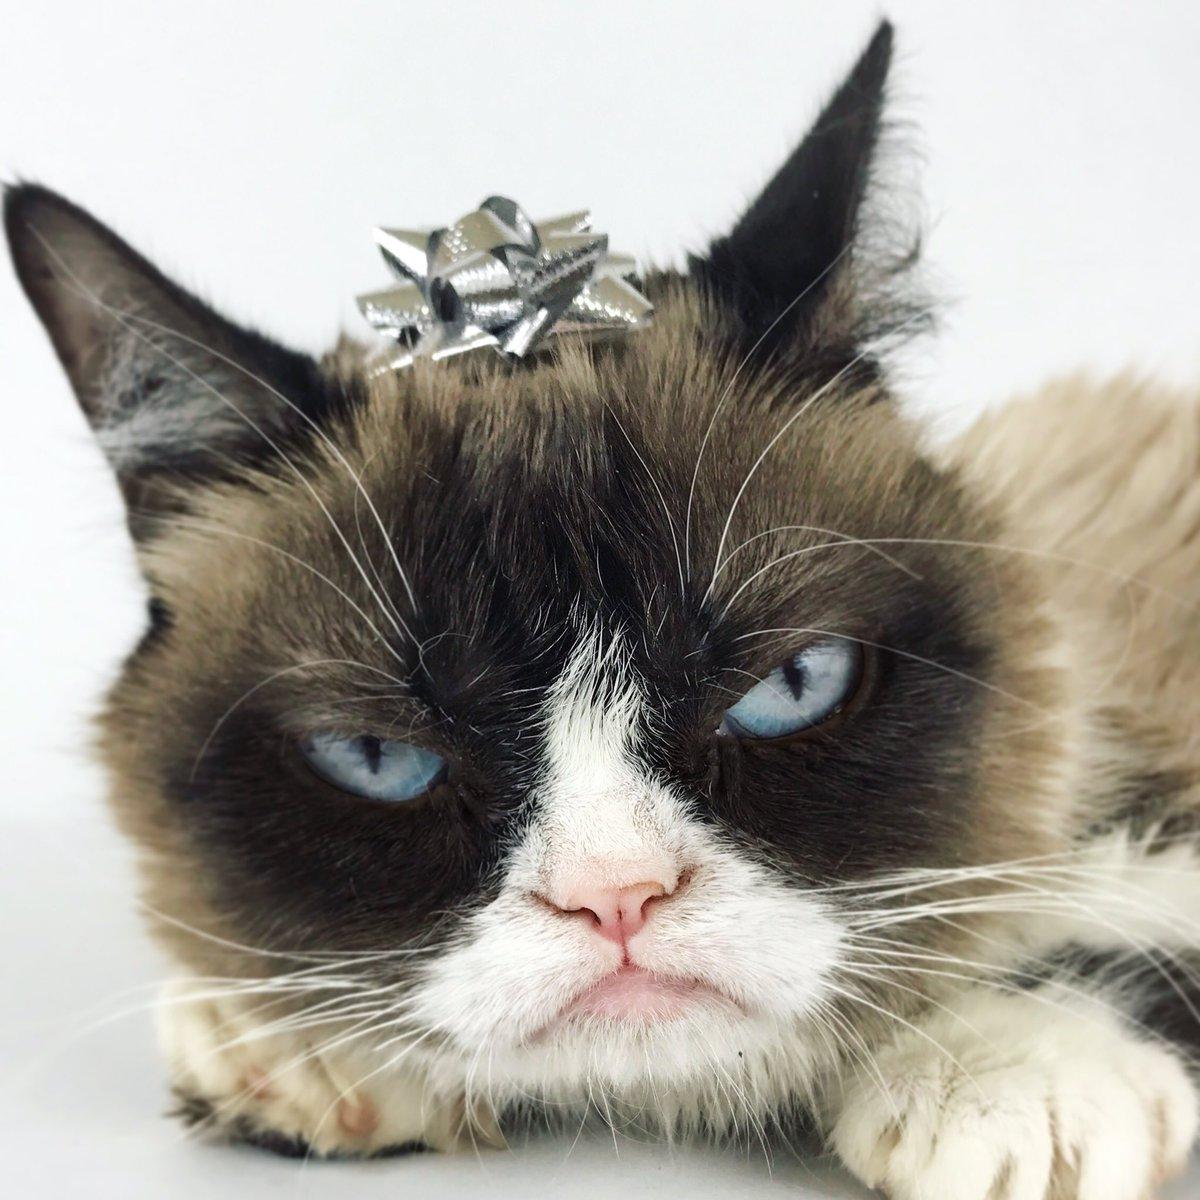 Grumpy Cat (@RealGrumpyCat)